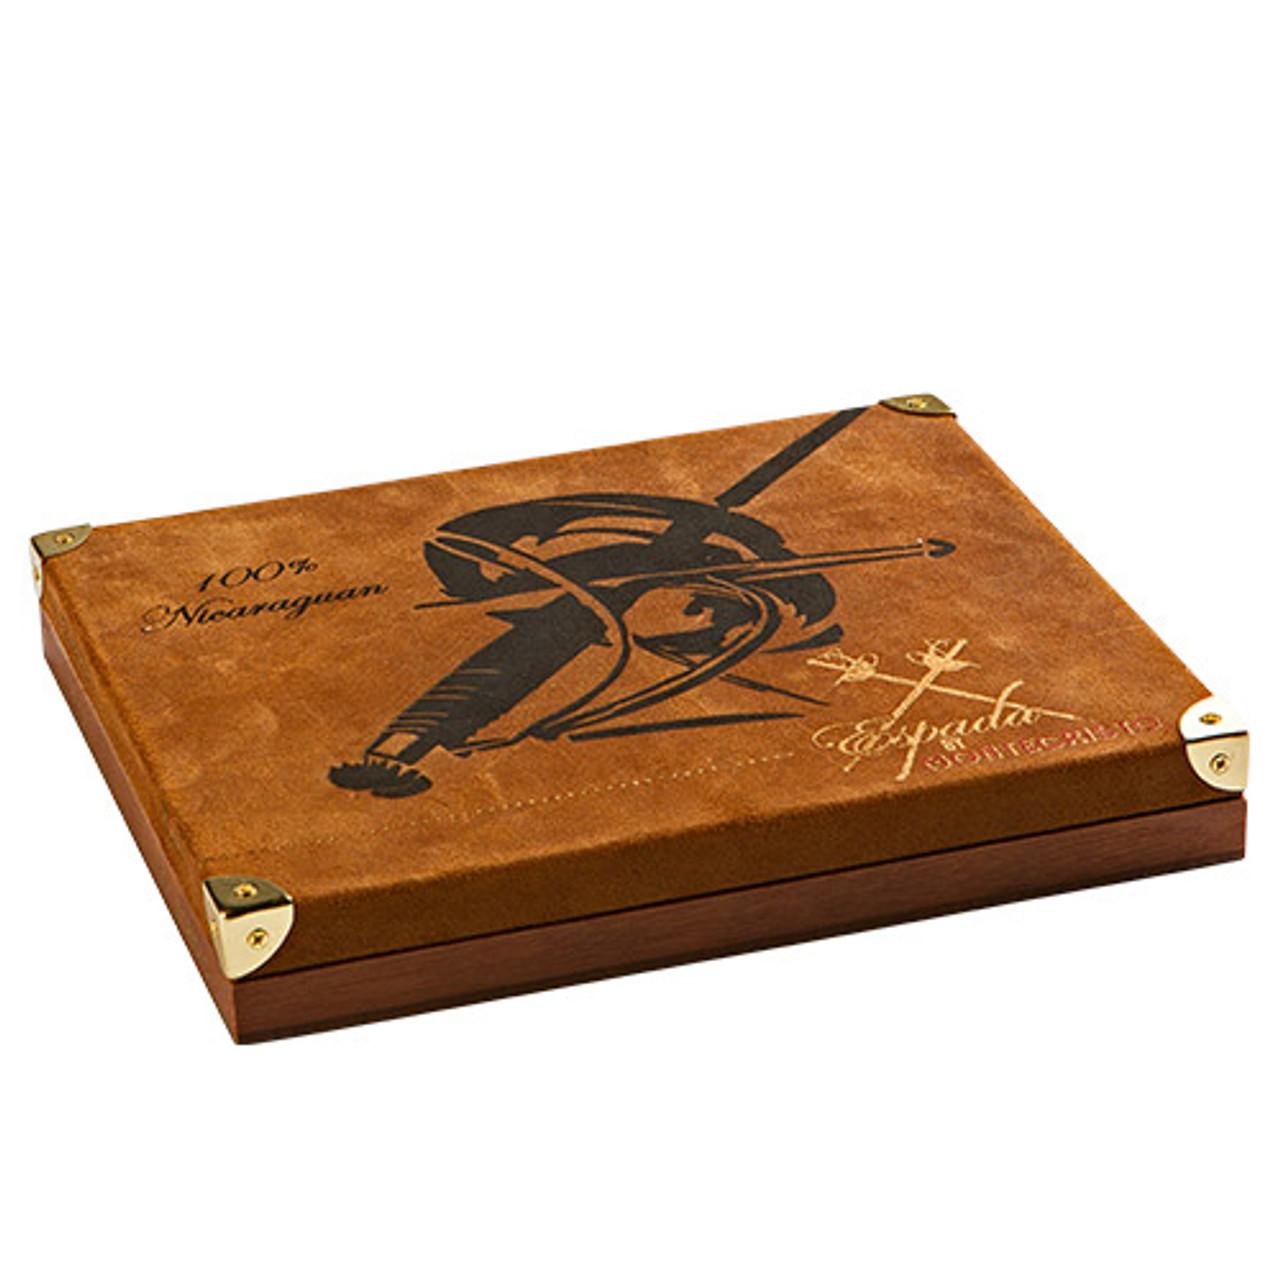 Montecristo Espada Estoque Cigars - 6 x 50 (Box of 10)